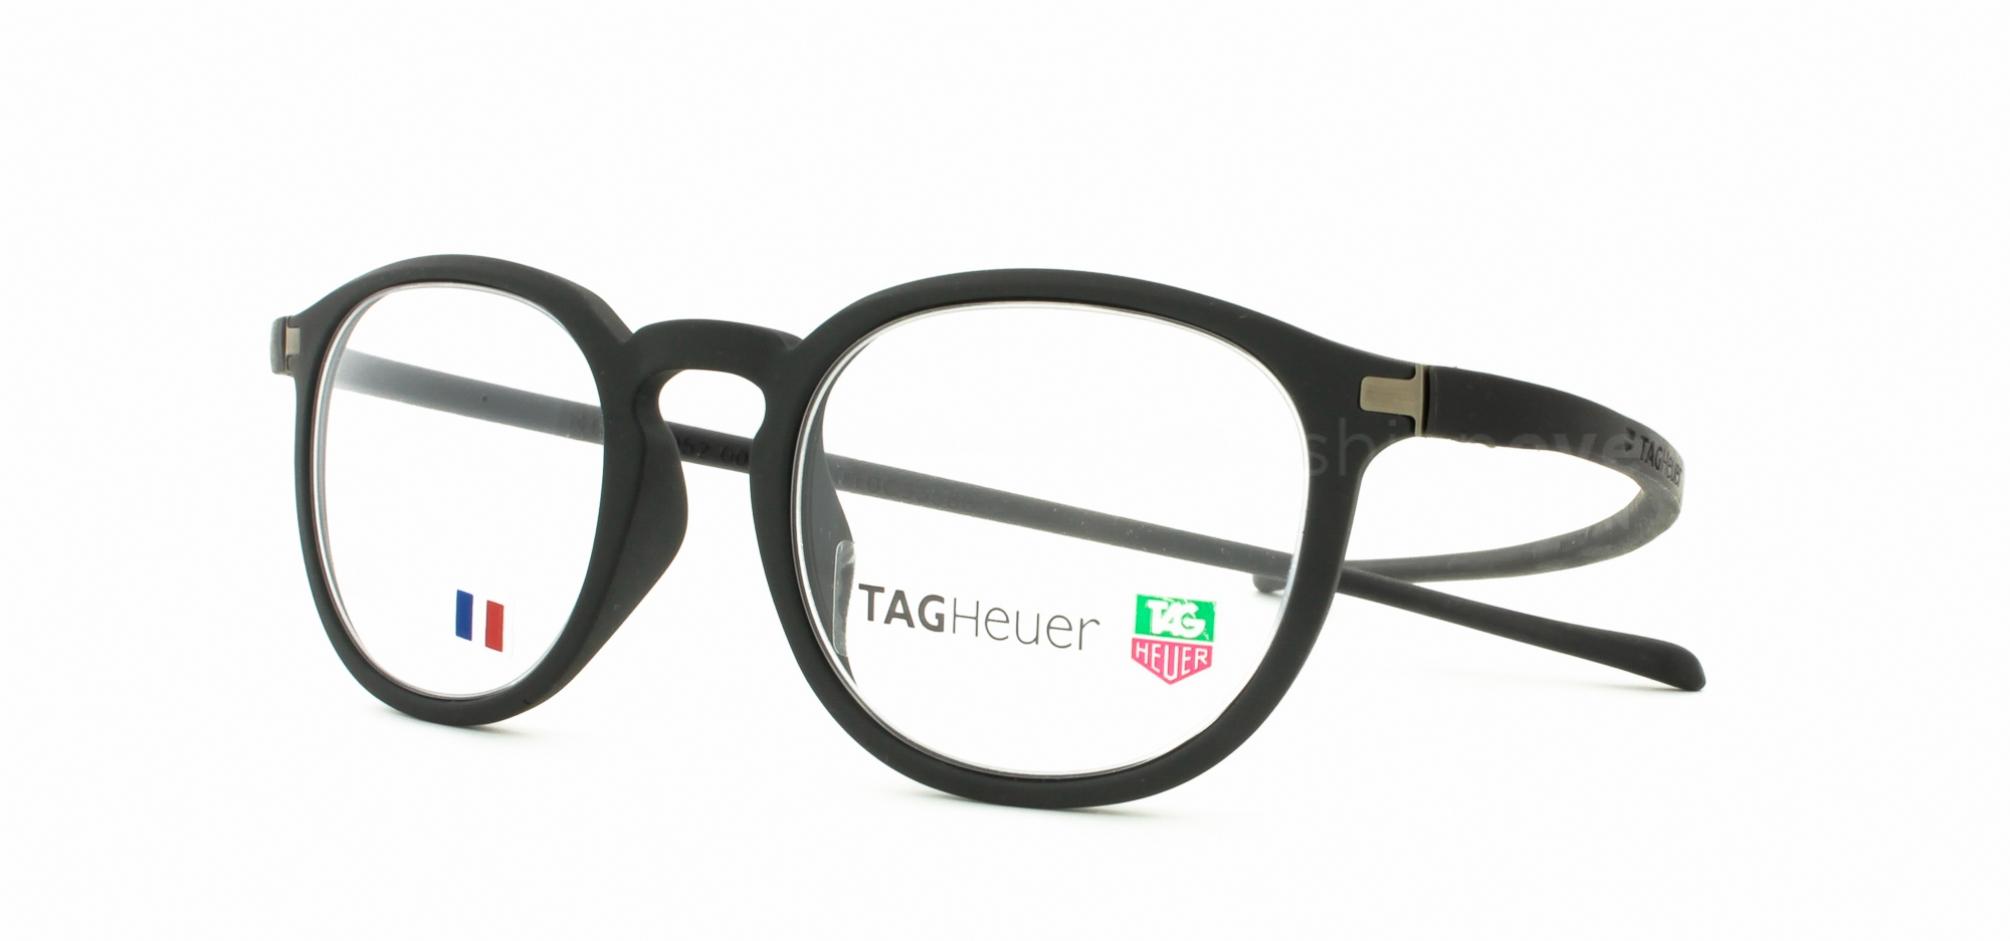 5d511fc55d454 Tag Heuer 3052 Eyeglasses